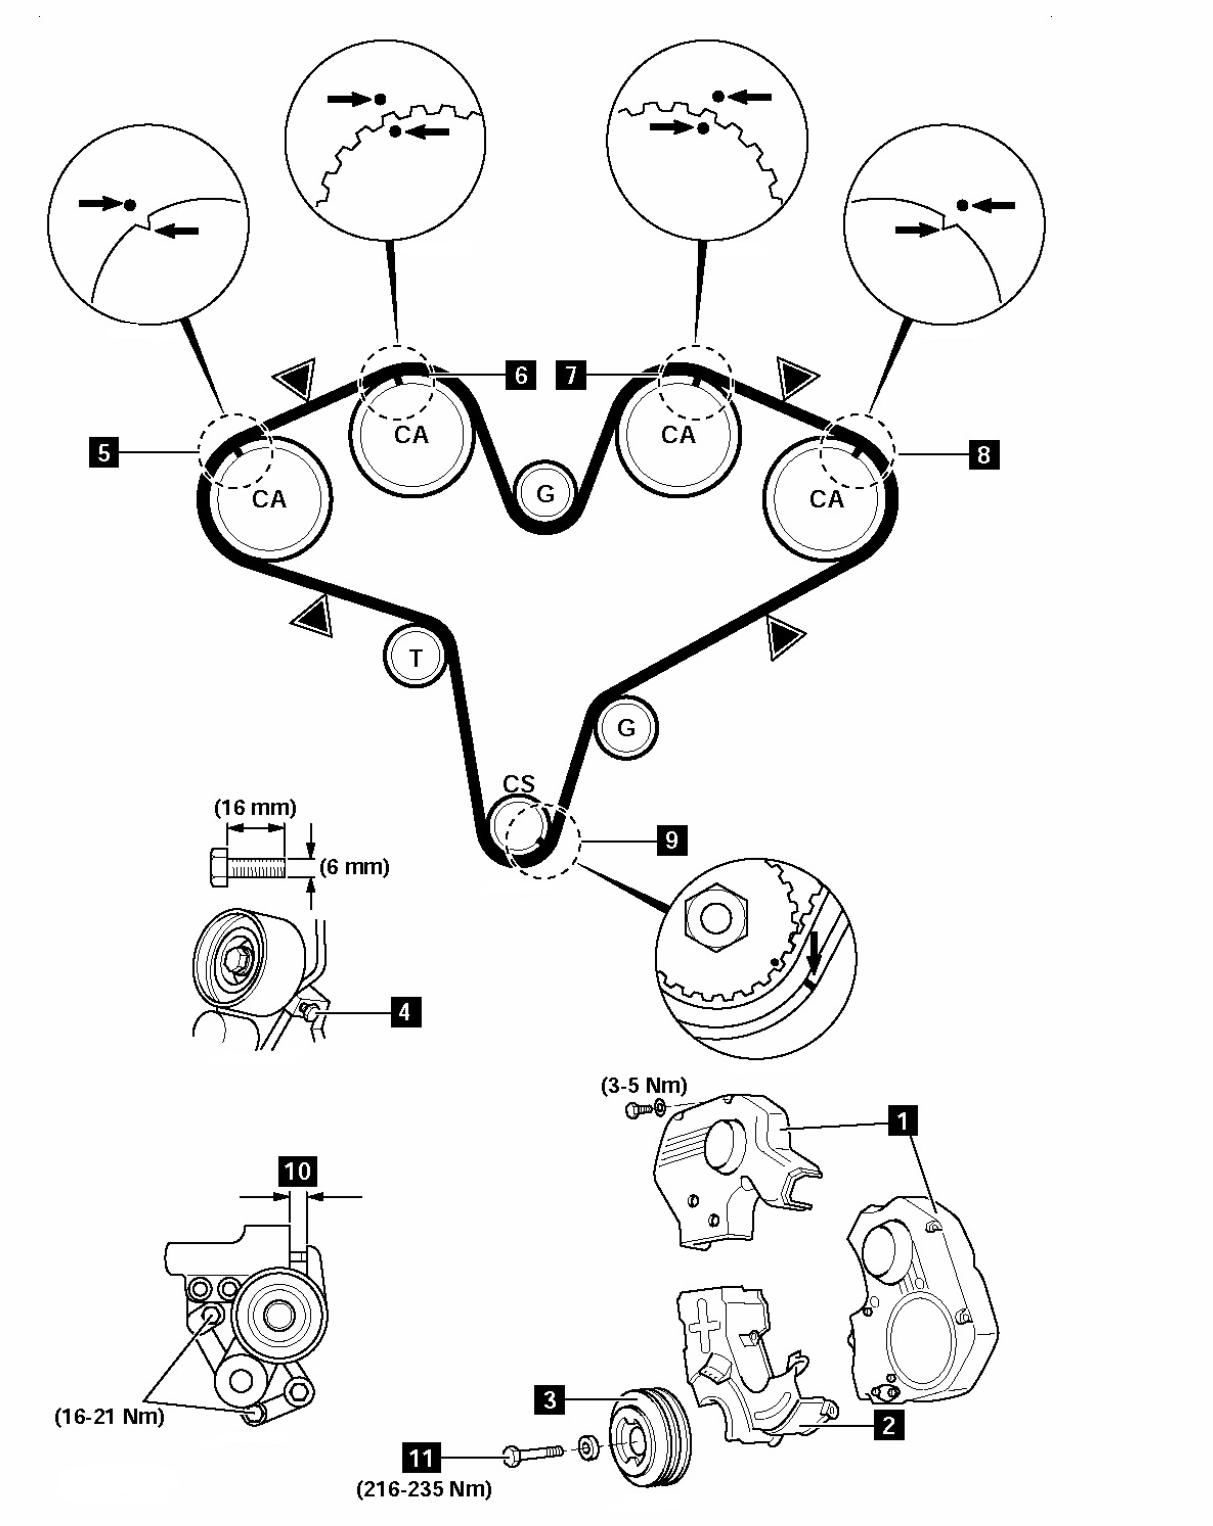 300zx belt diagram wiring diagram 2001 Nissan Pathfinder Belt Tensioner 300zx timing belt diagram manual e booksi u0027ve noticed on some 90 96 300zx